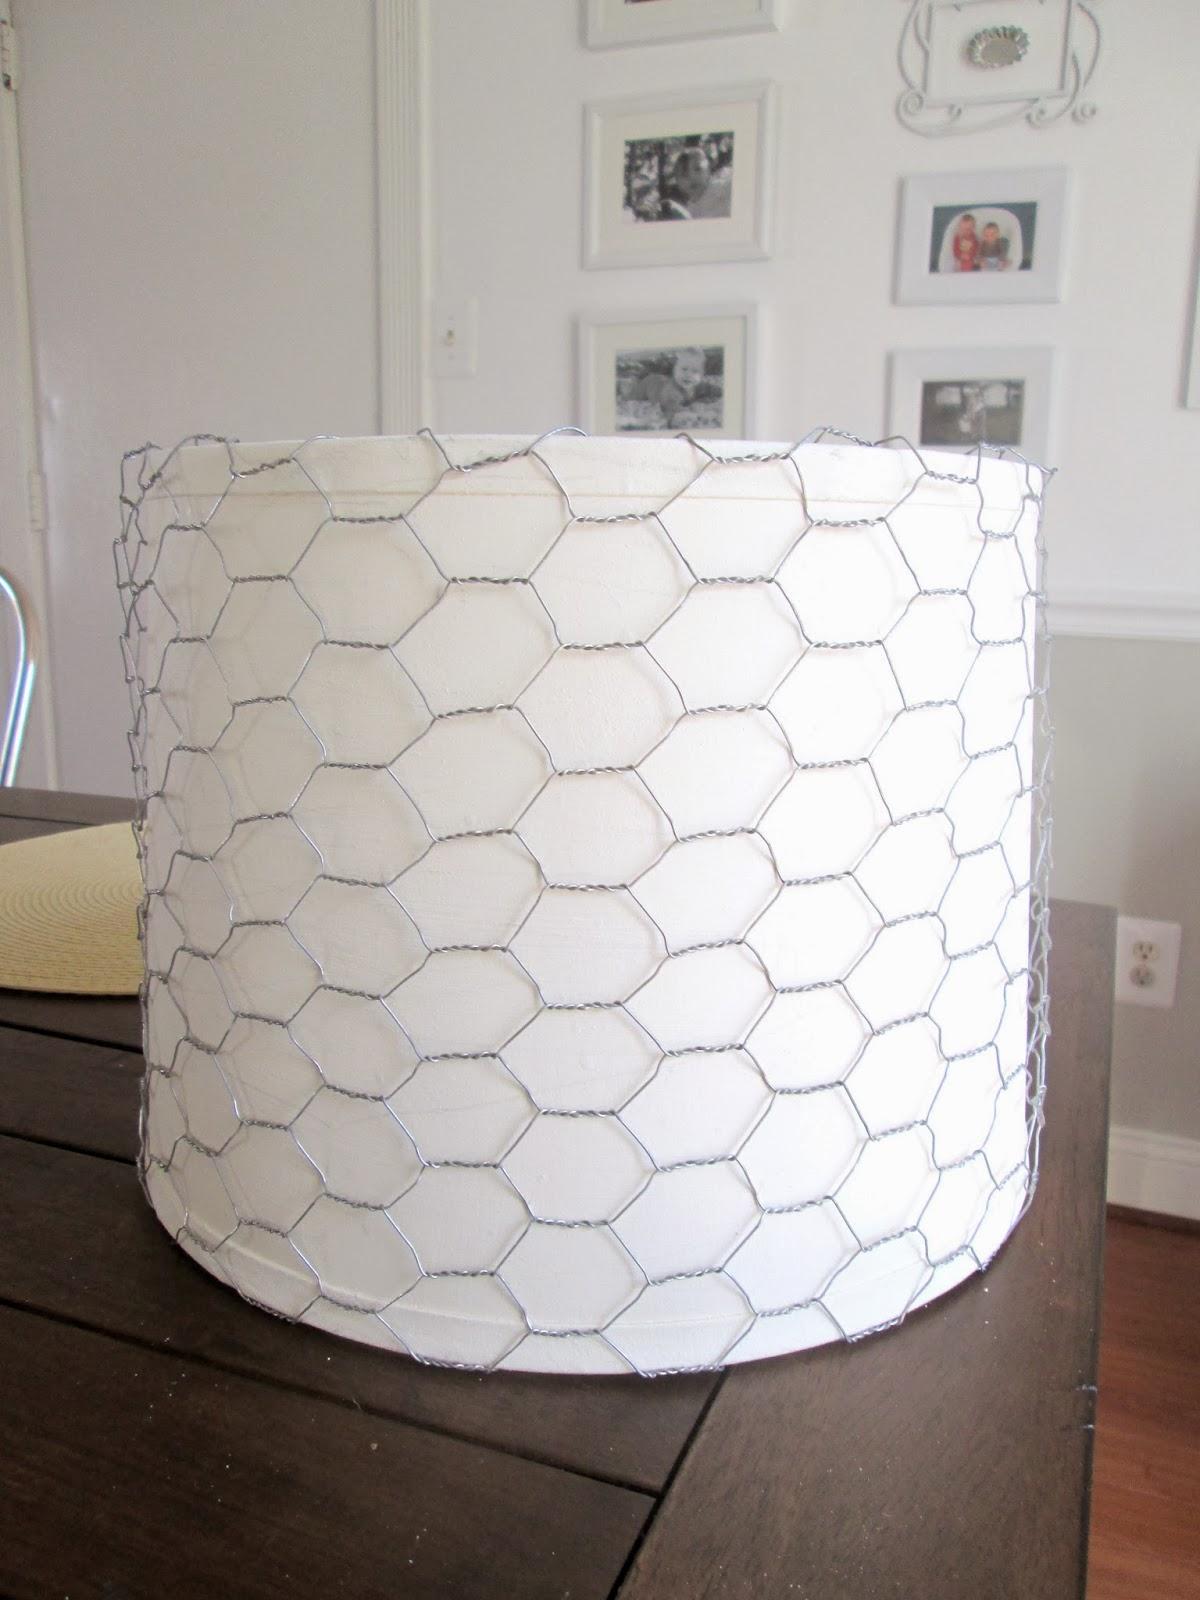 lampshades1.jpg